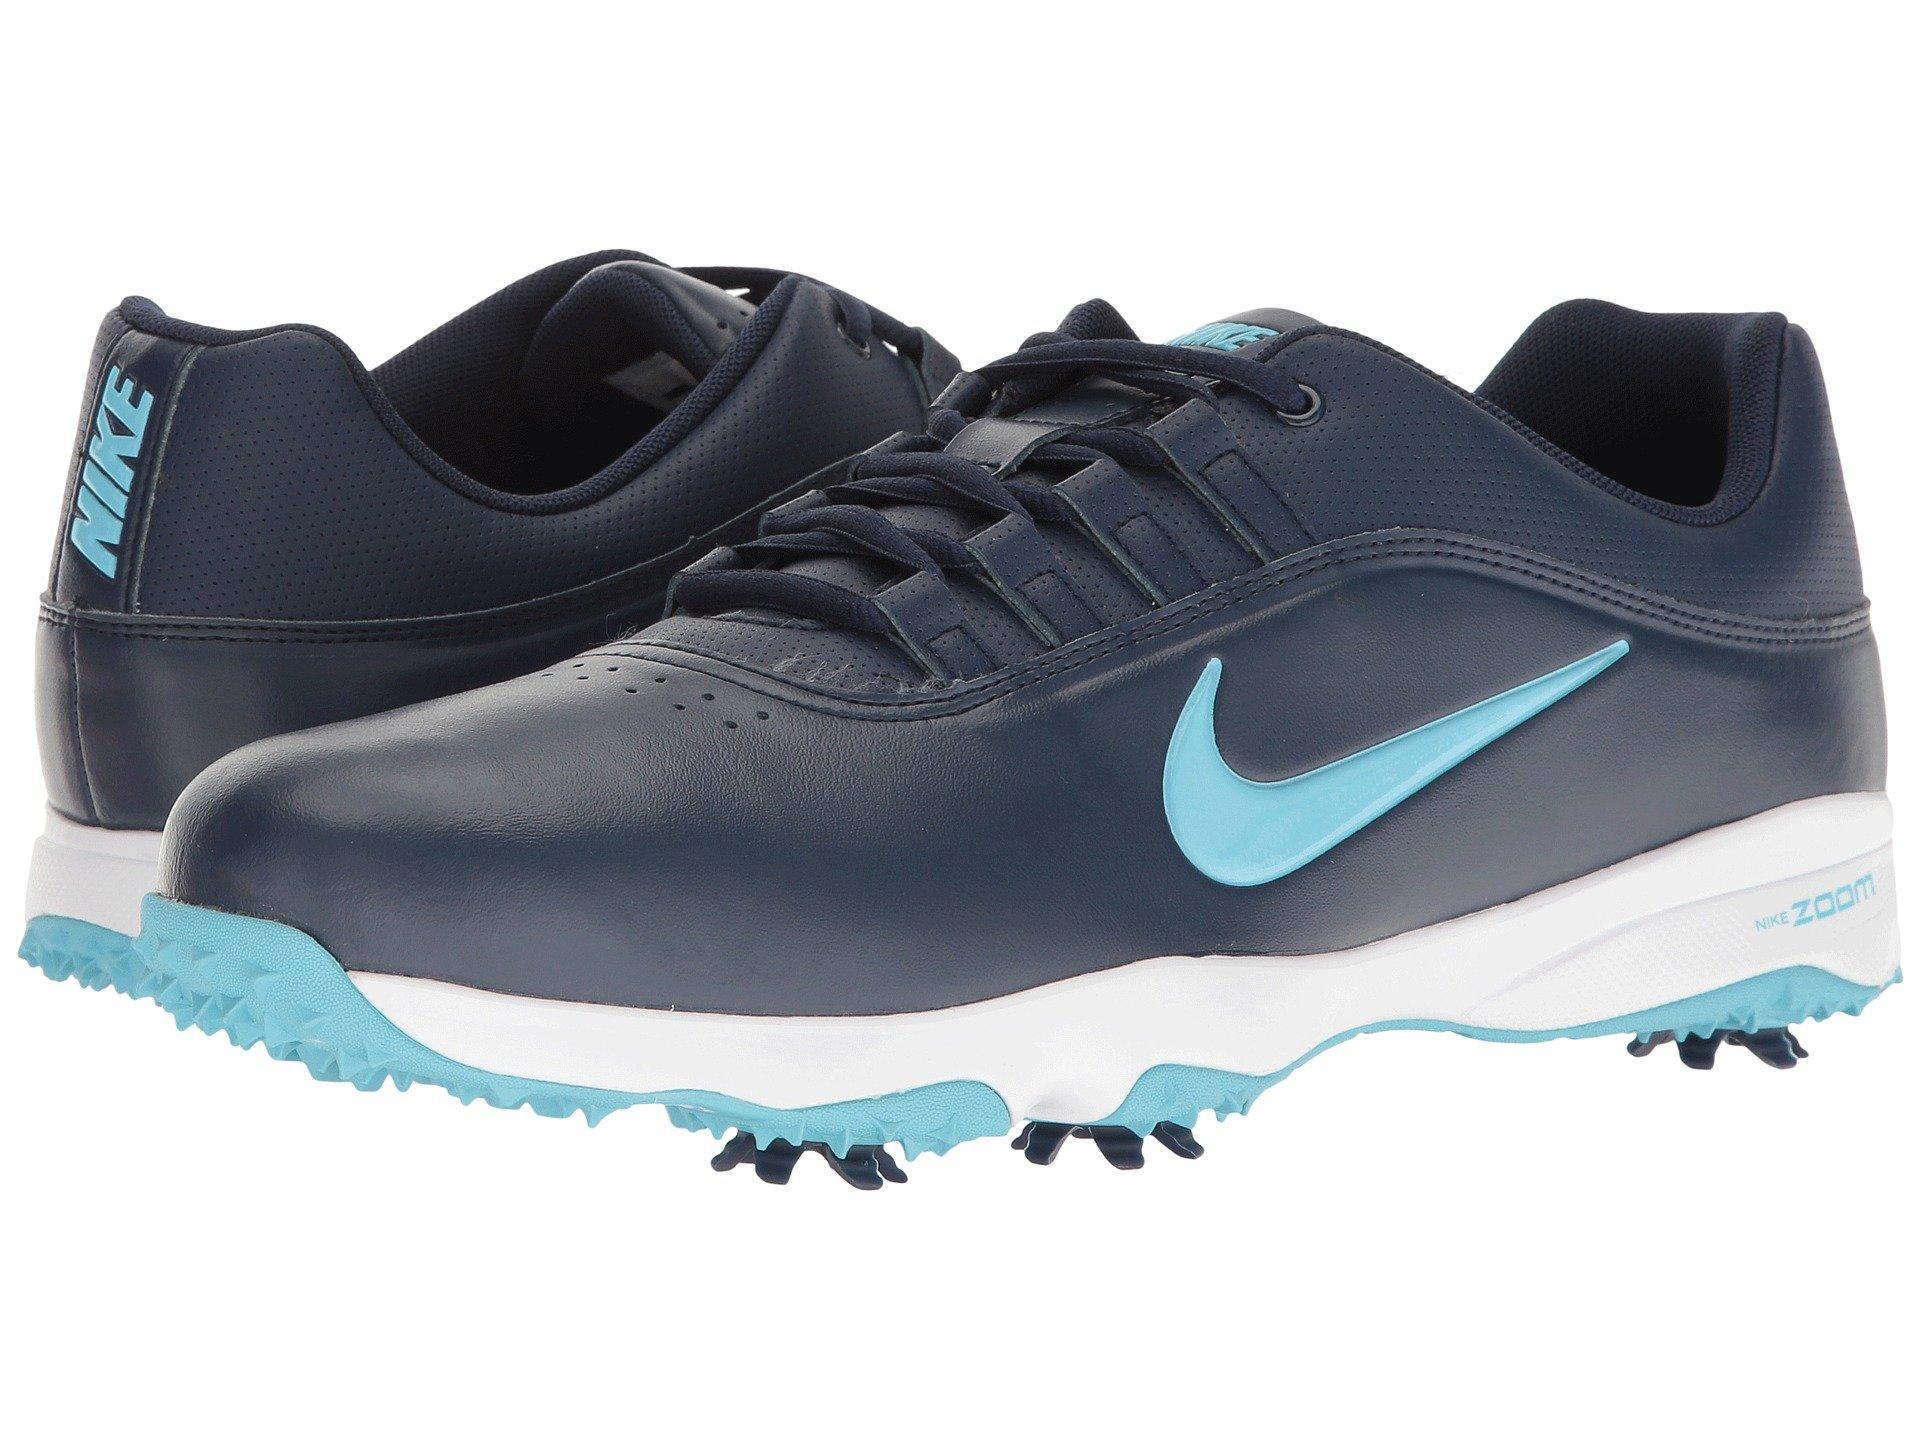 Nike Air Zoom Rival 5 In Midnight Navy/vivid Sky/white